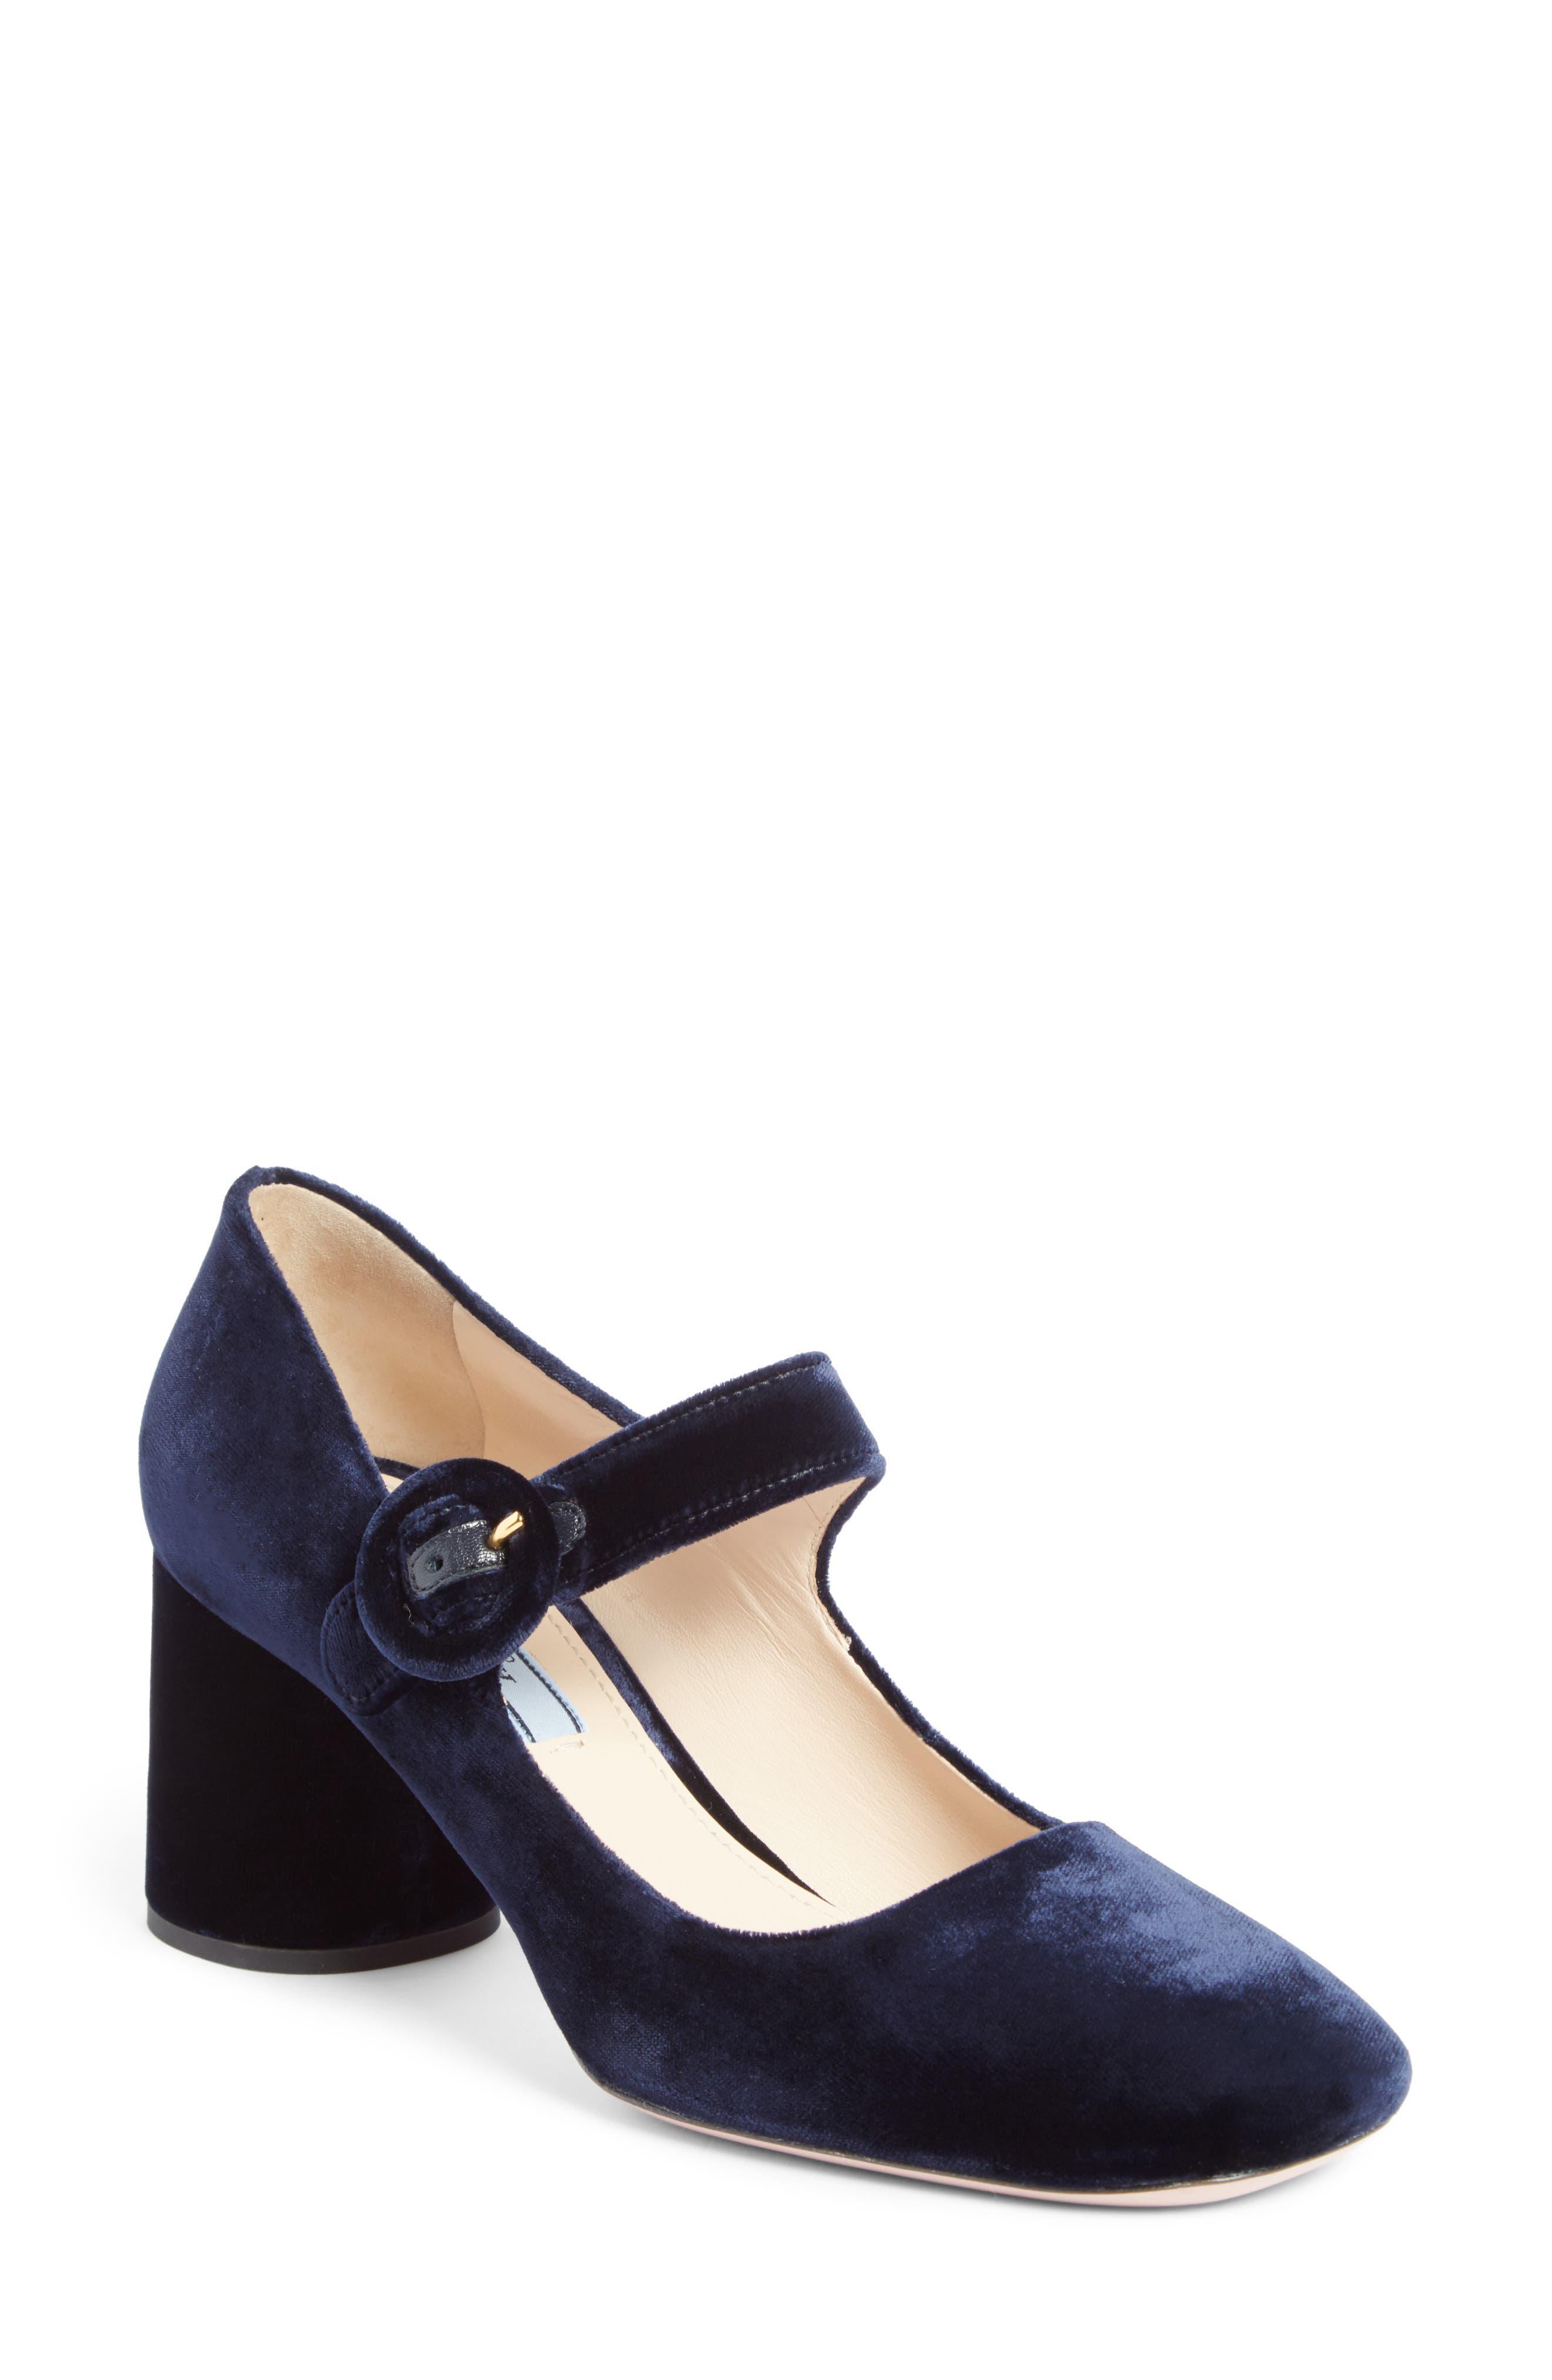 Alternate Image 1 Selected - Prada Block Heel Mary Jane Pump (Women)